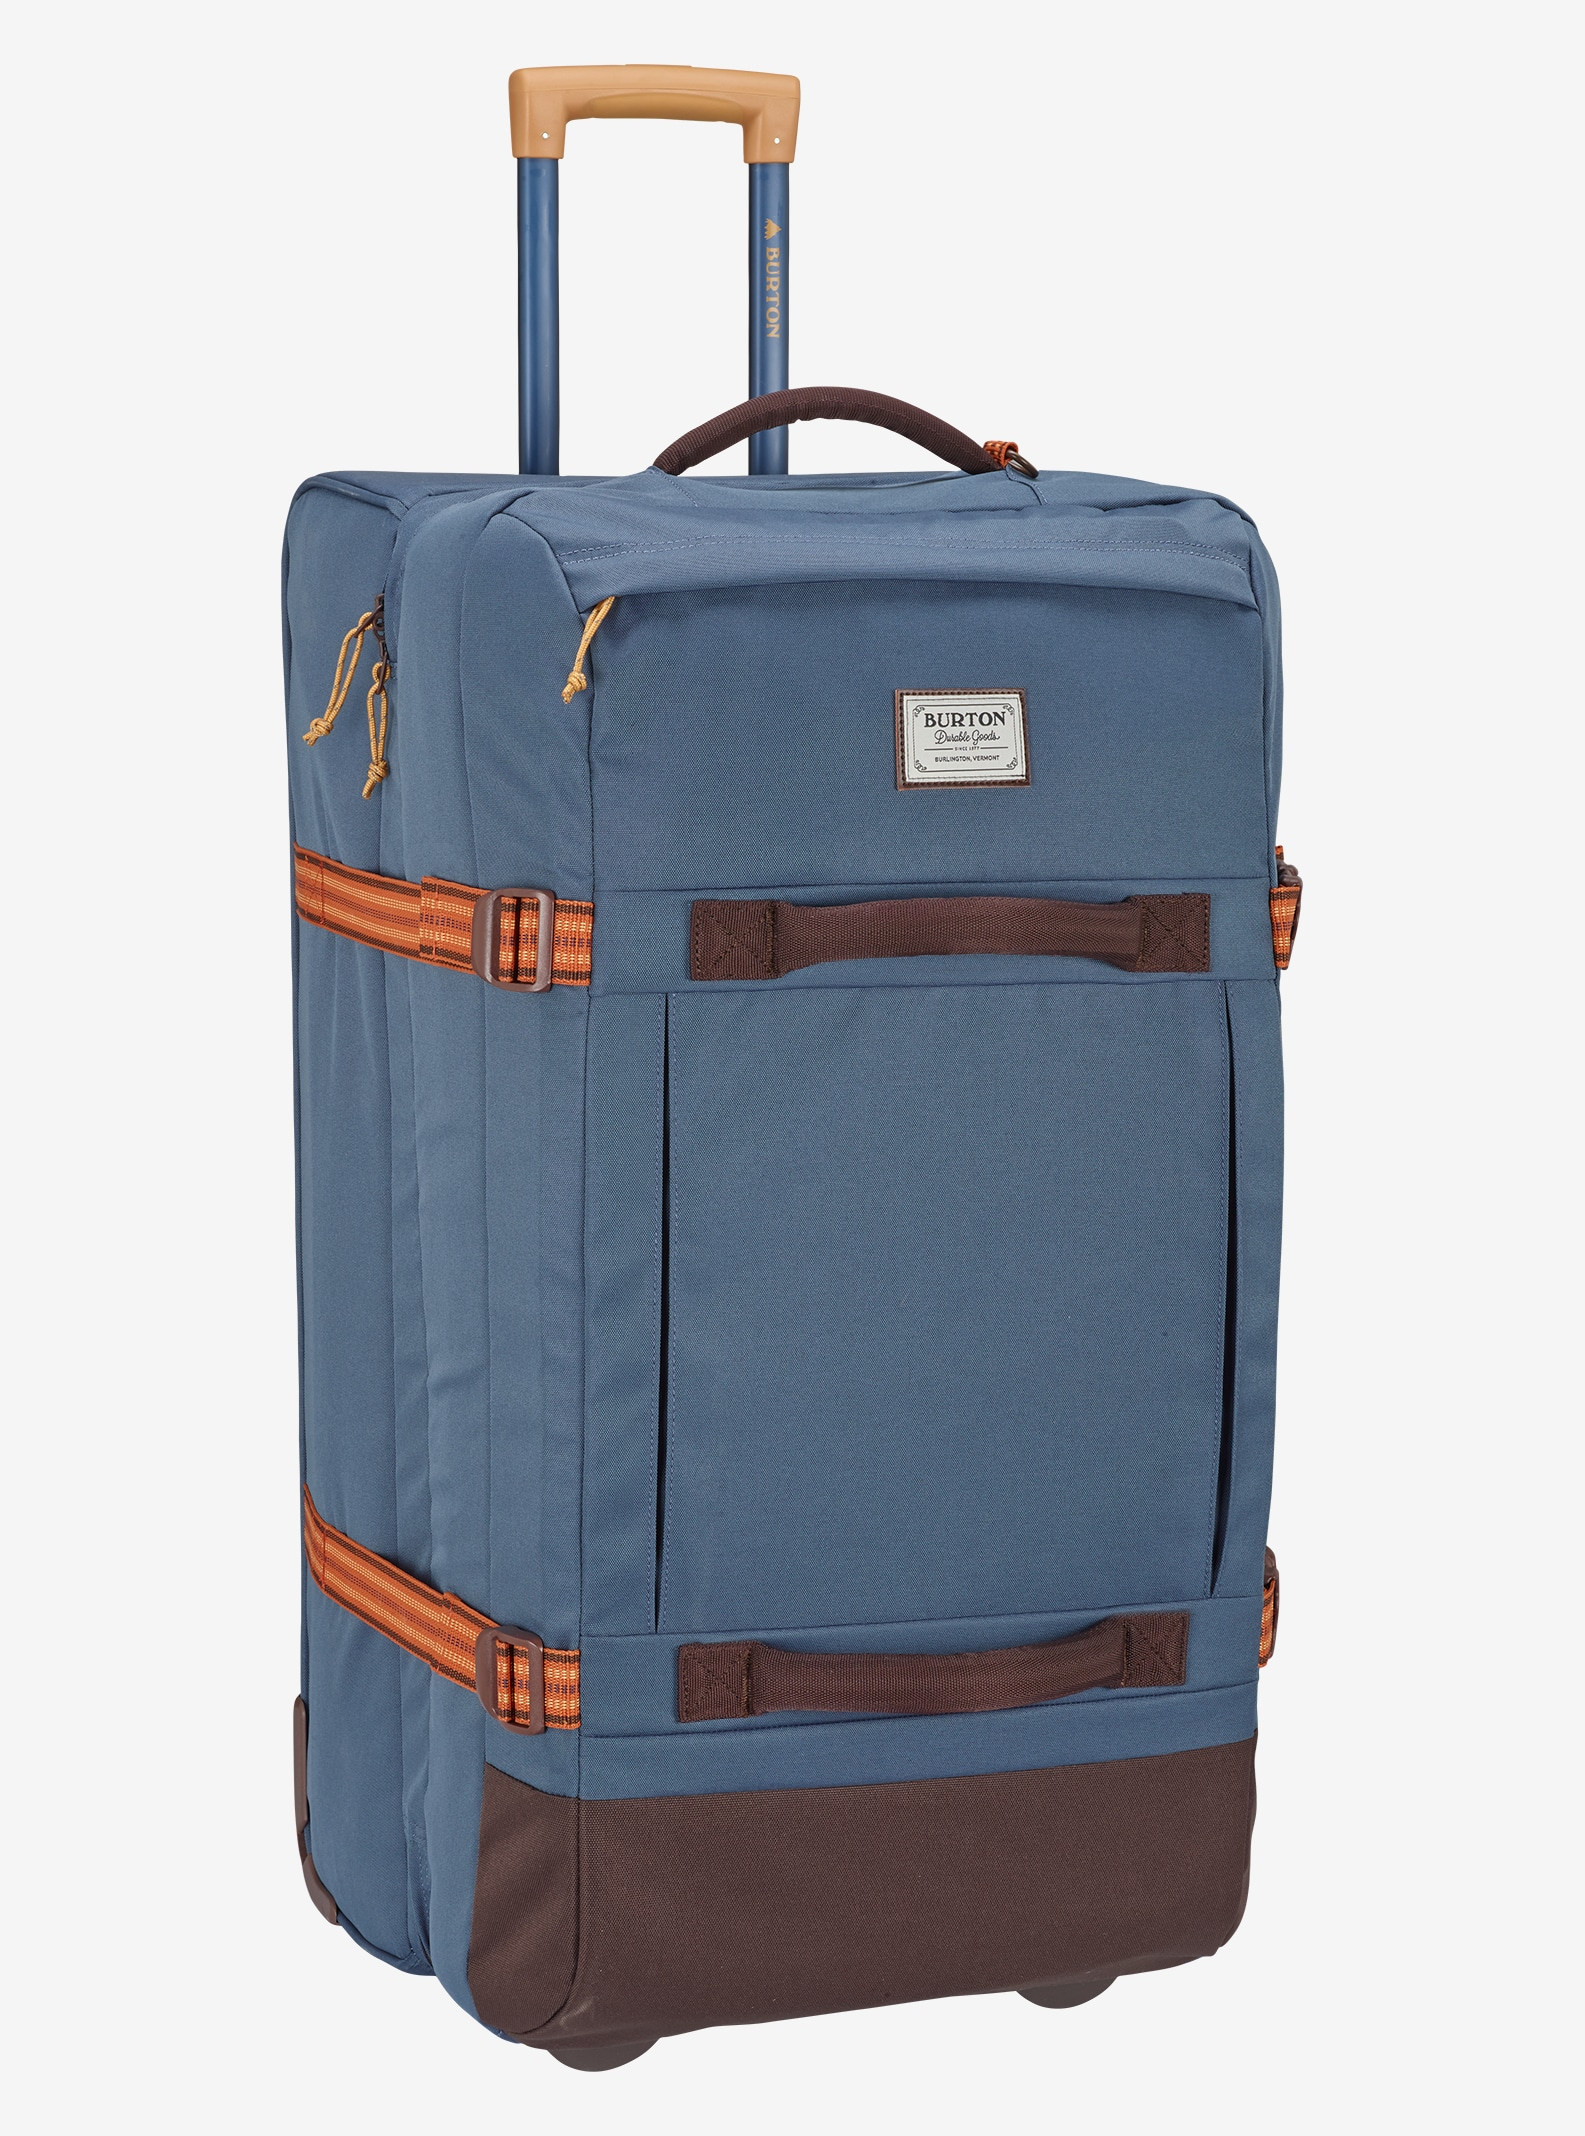 Sale Luggage | Burton Snowboards